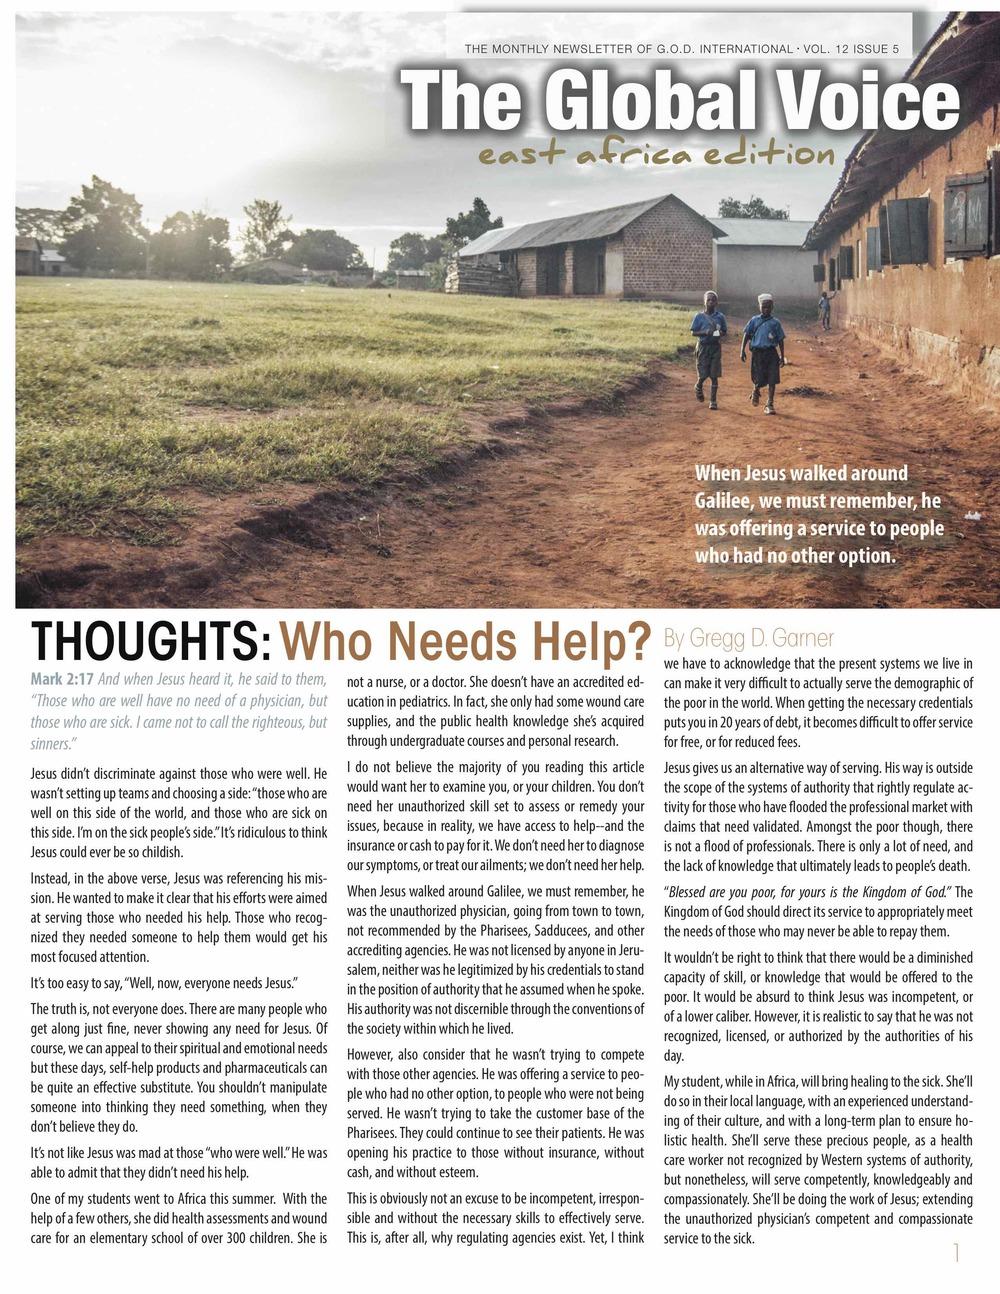 Global Voice - East Africa (Oct 14).jpg